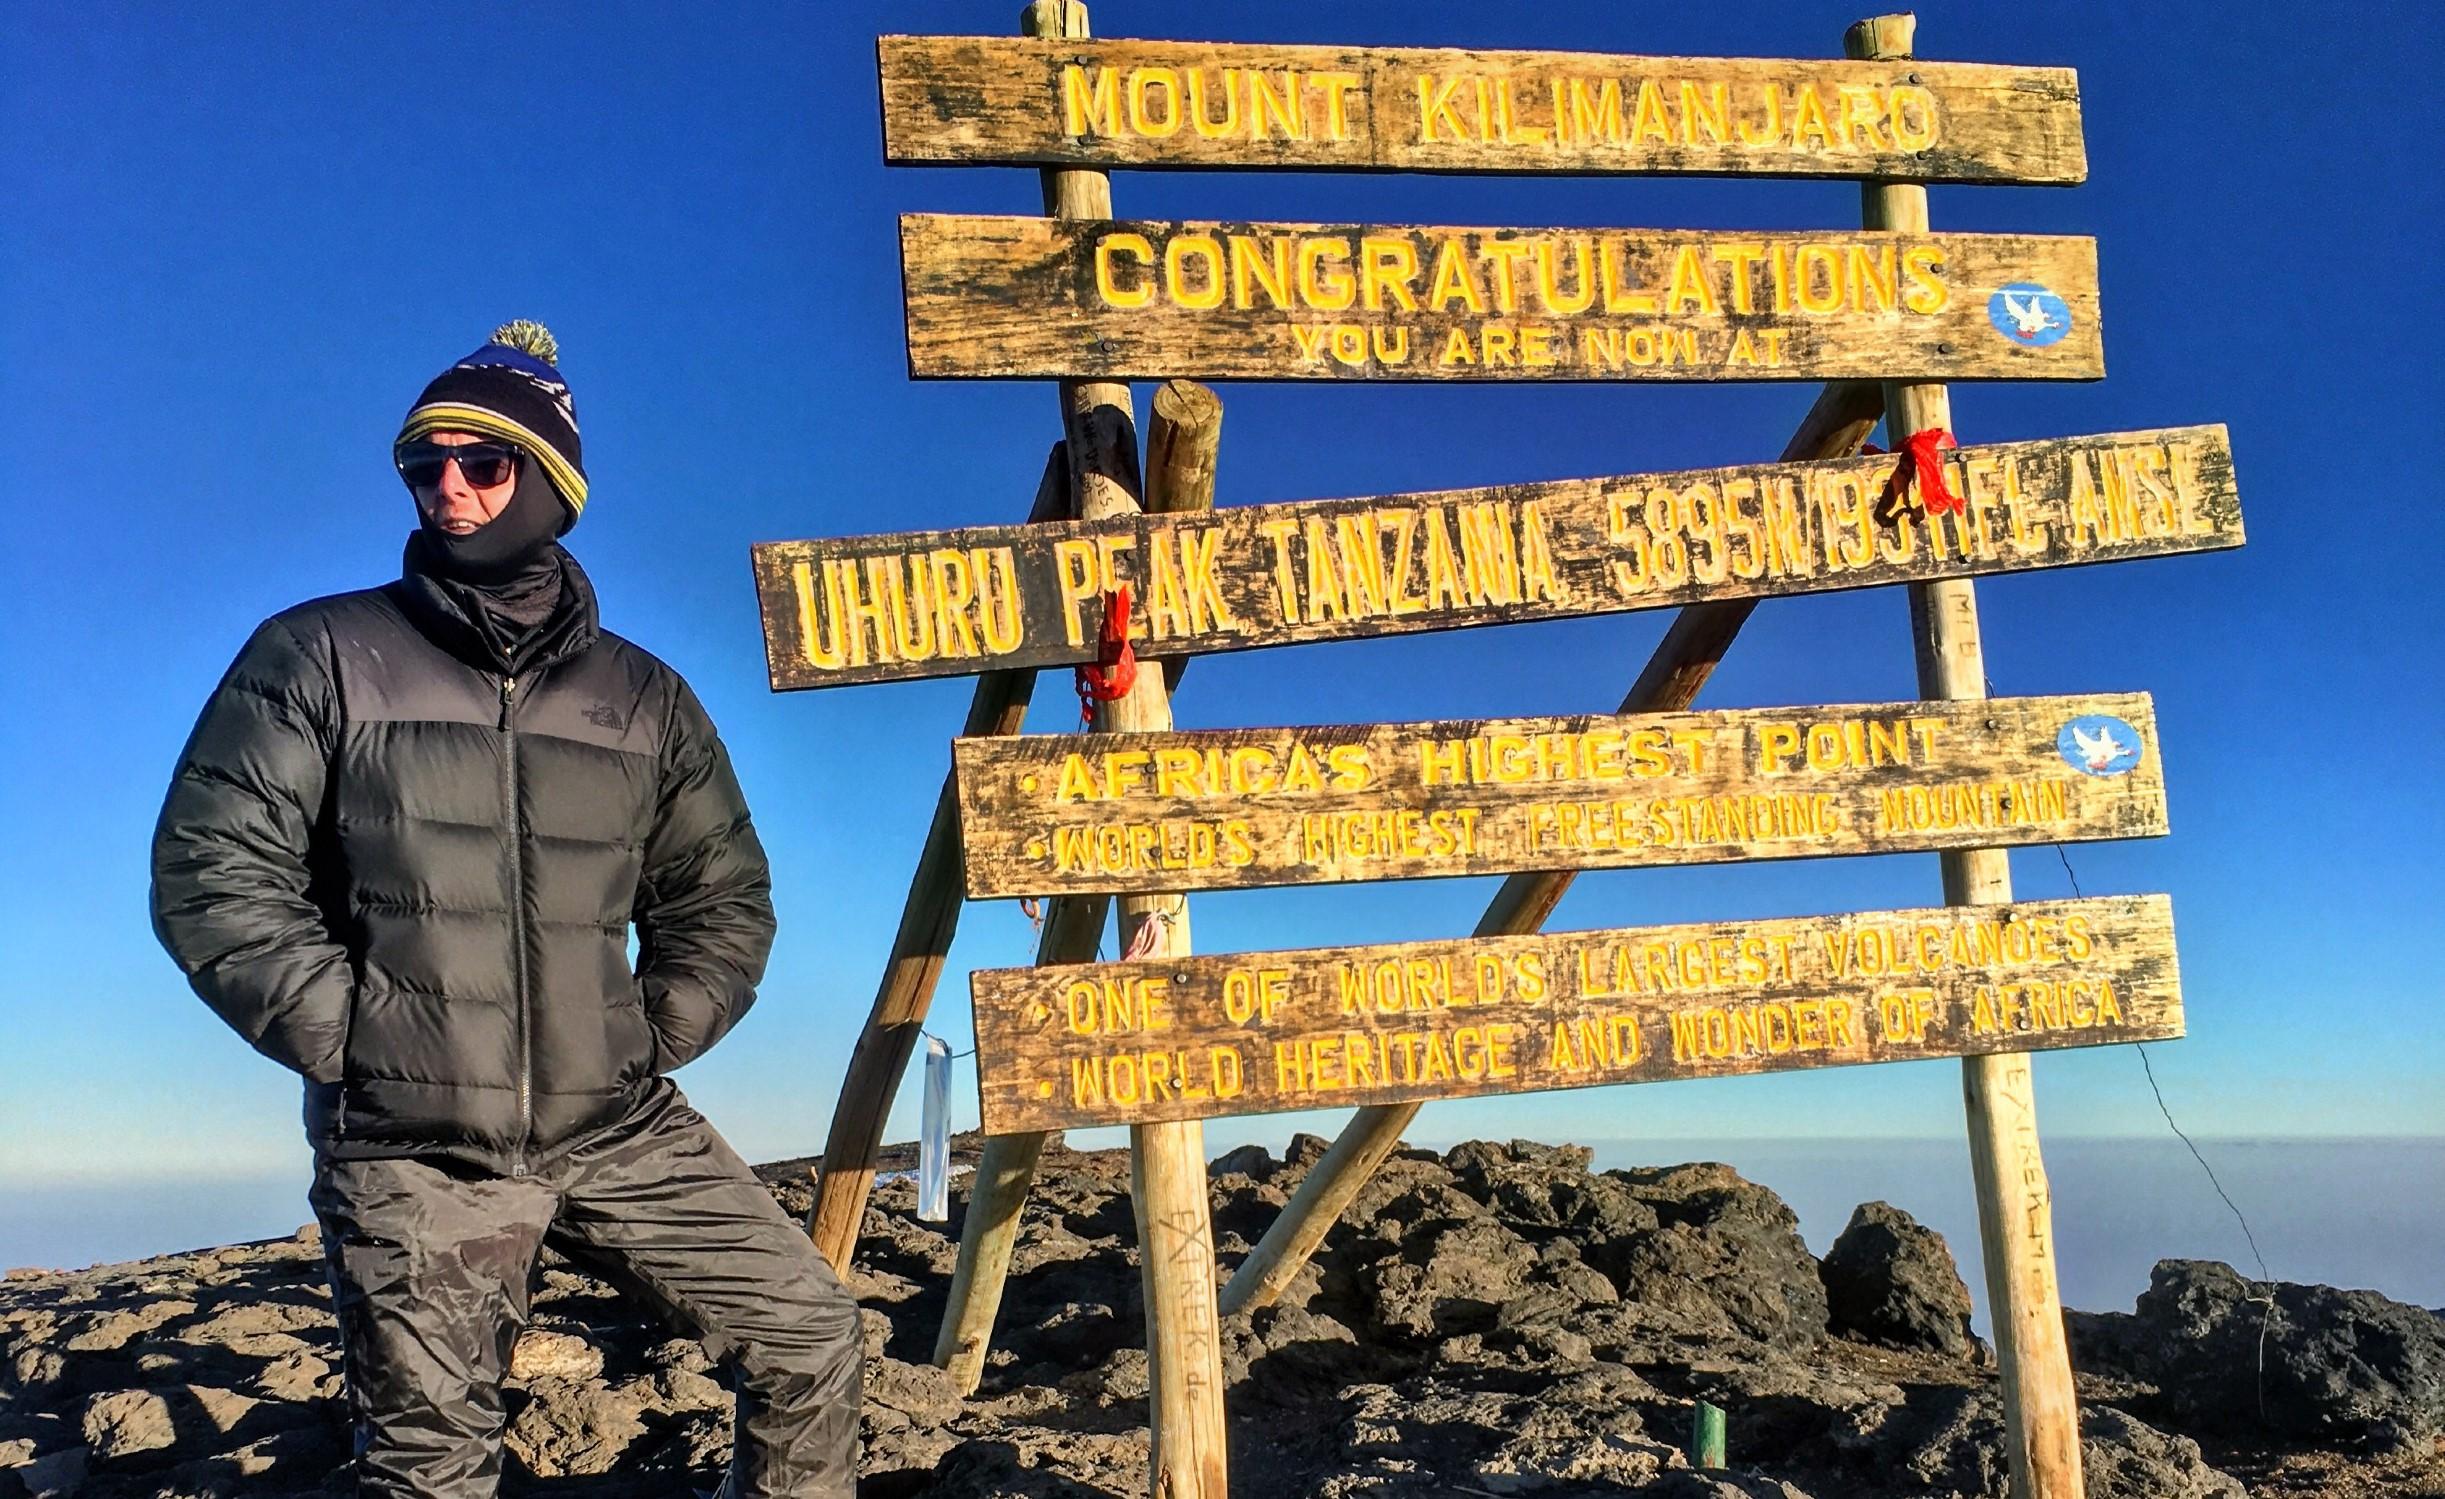 Matt & Ben Kilimanjaro – Matt & sign (2)